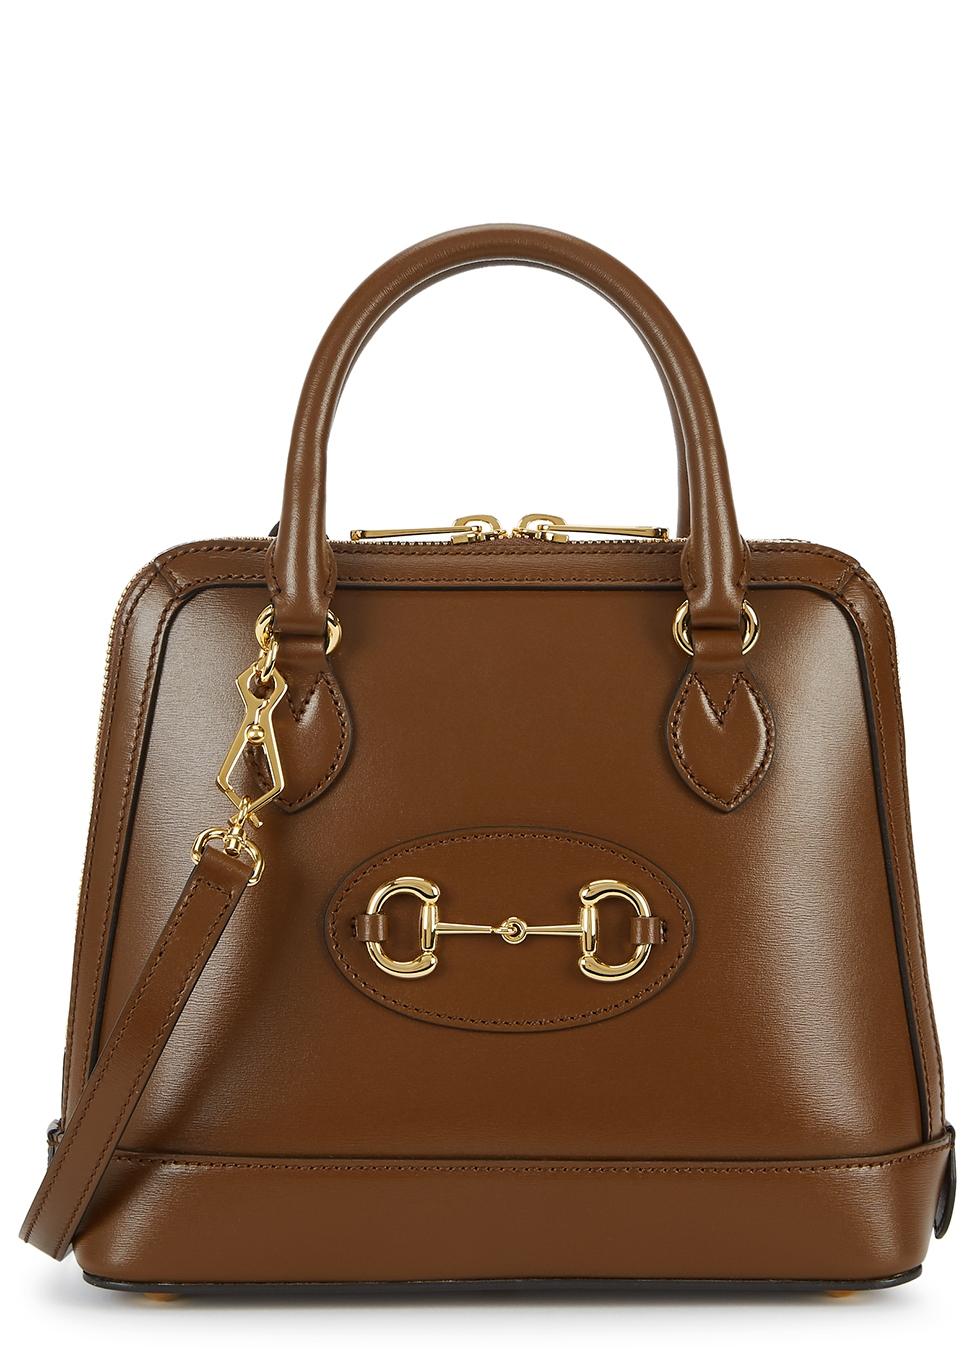 1955 Horsebit brown leather top handle bag